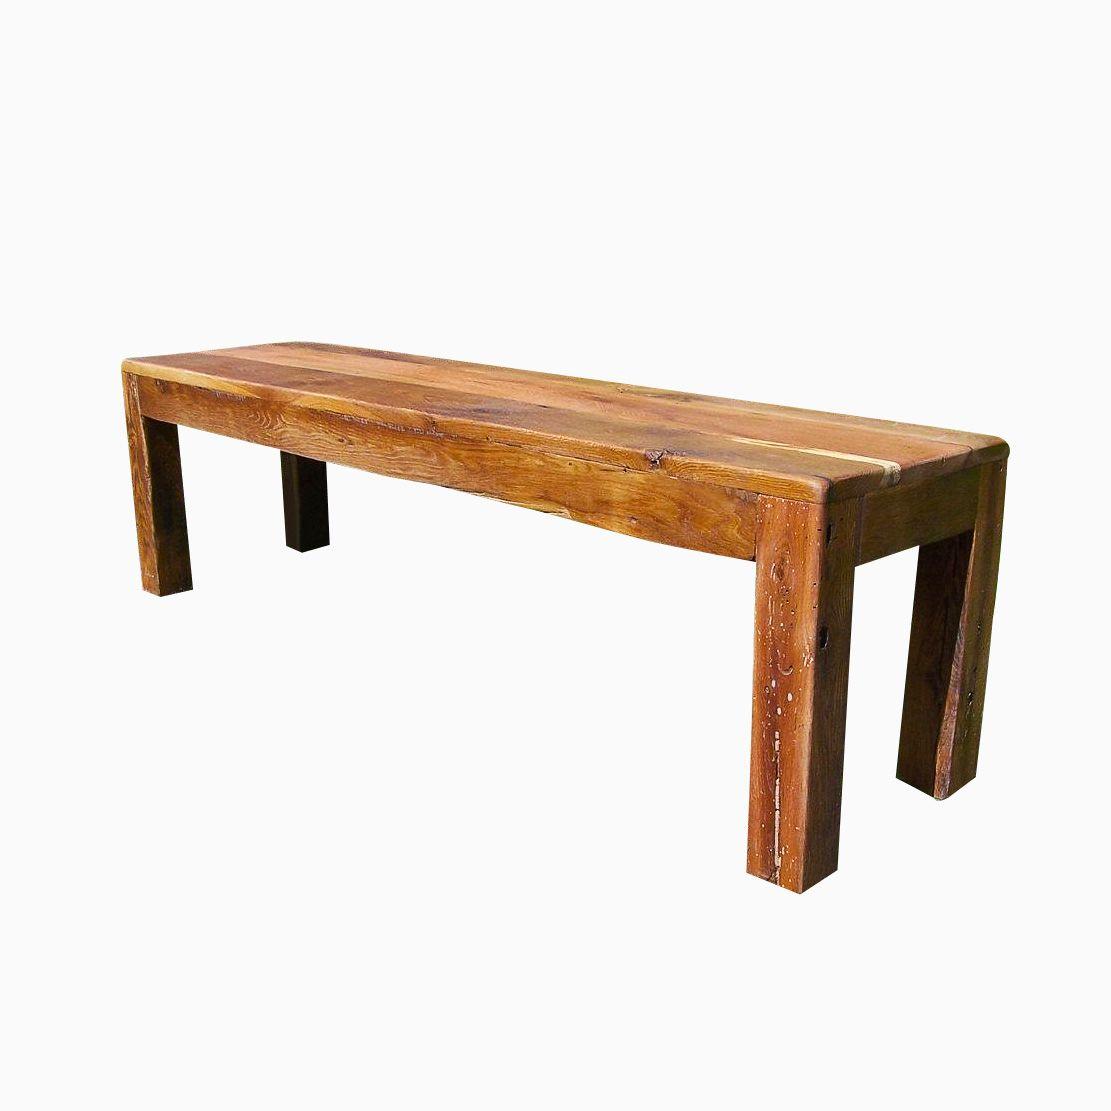 Phenomenal Buy A Hand Crafted Reclaimed Barn Wood Parsons Style Bench Creativecarmelina Interior Chair Design Creativecarmelinacom